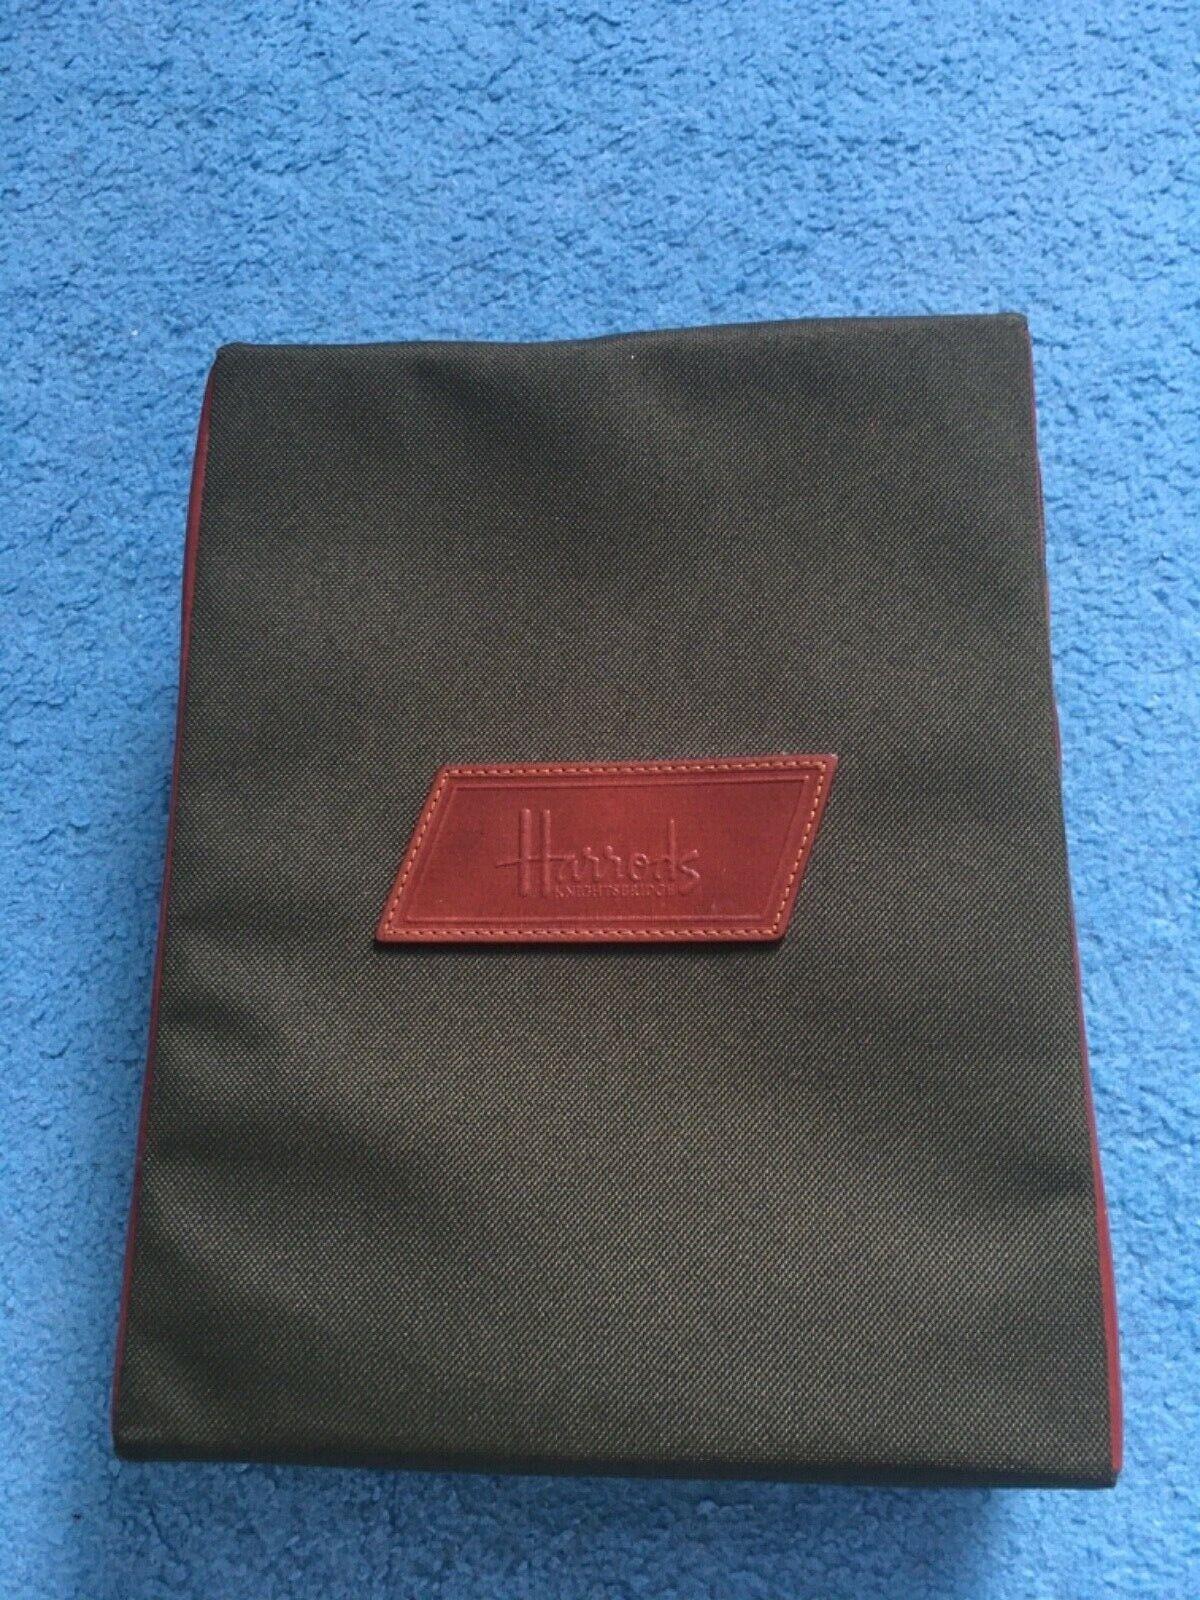 "New Harrods Stuffed Shirt Travel zip bag tidy business Vintage 11"" x 8,5"""